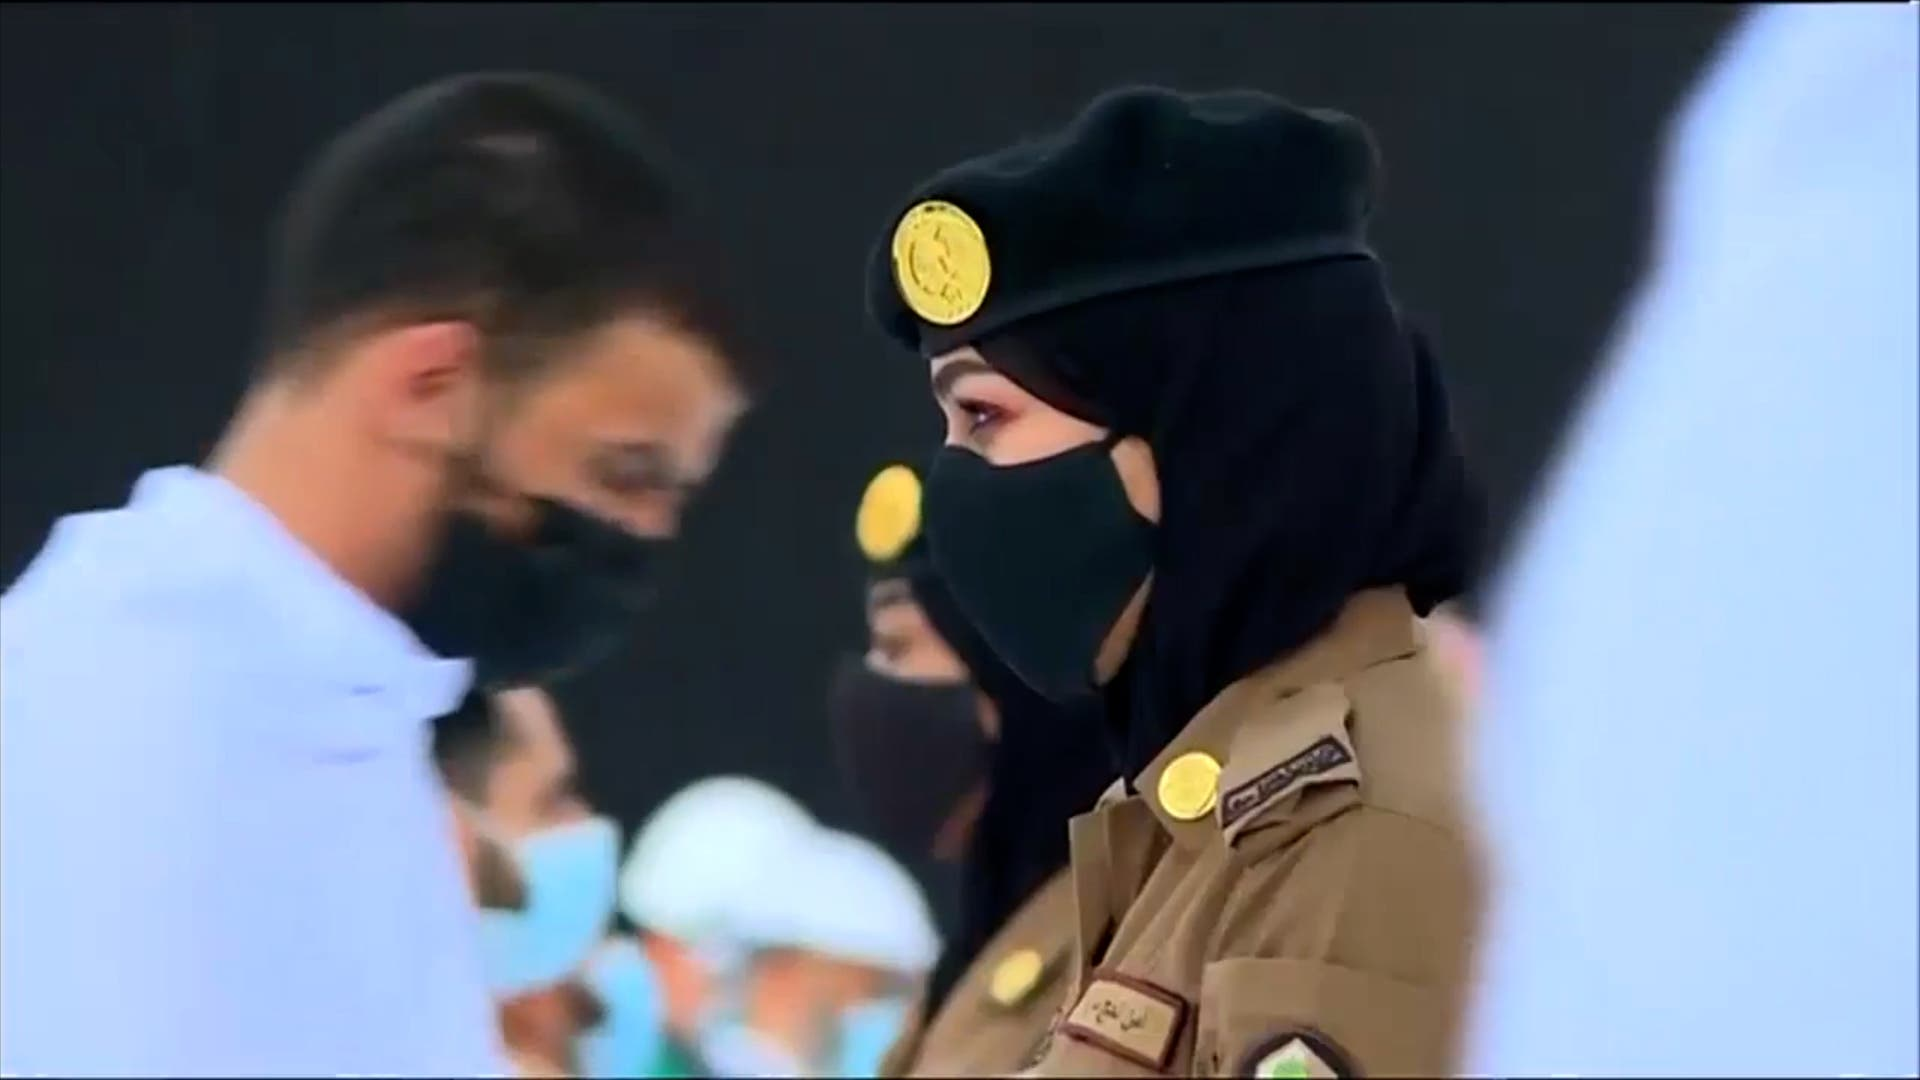 Saudi female police officers are now supervising Umrah pilgrims